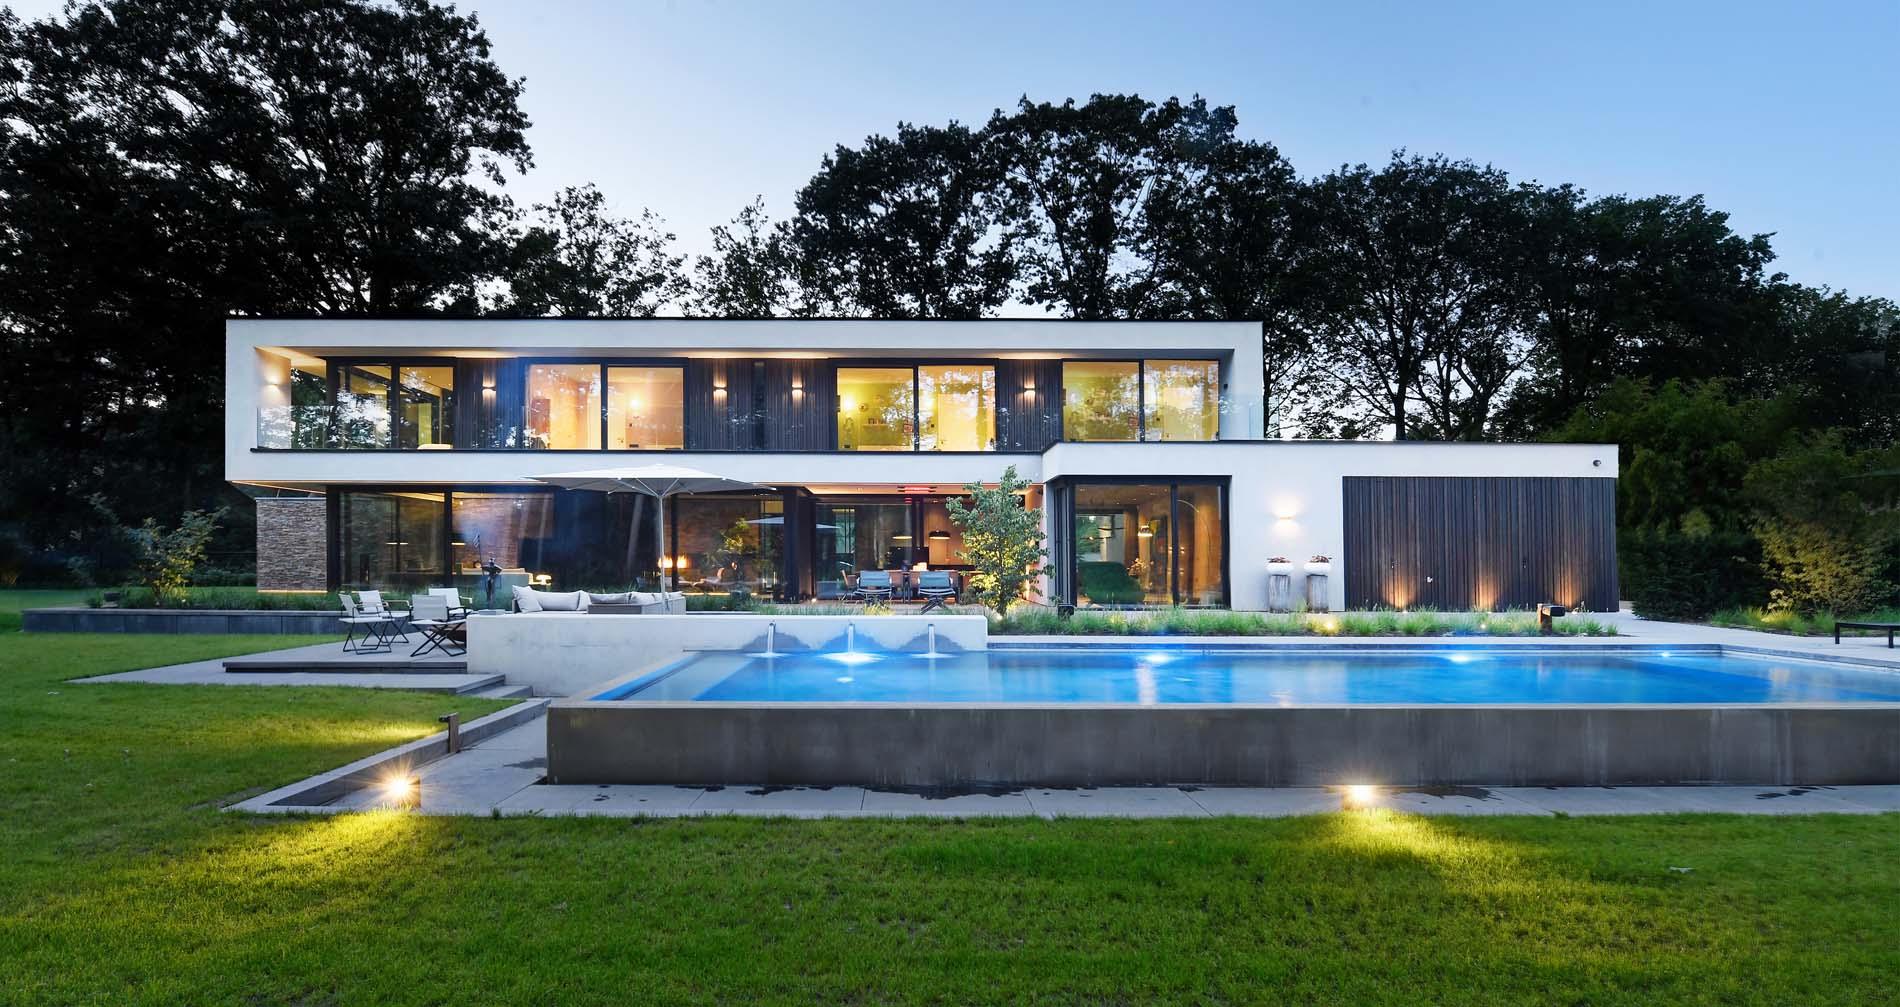 Unieke villa in de bossen The Art of Living, ASWA Keukens